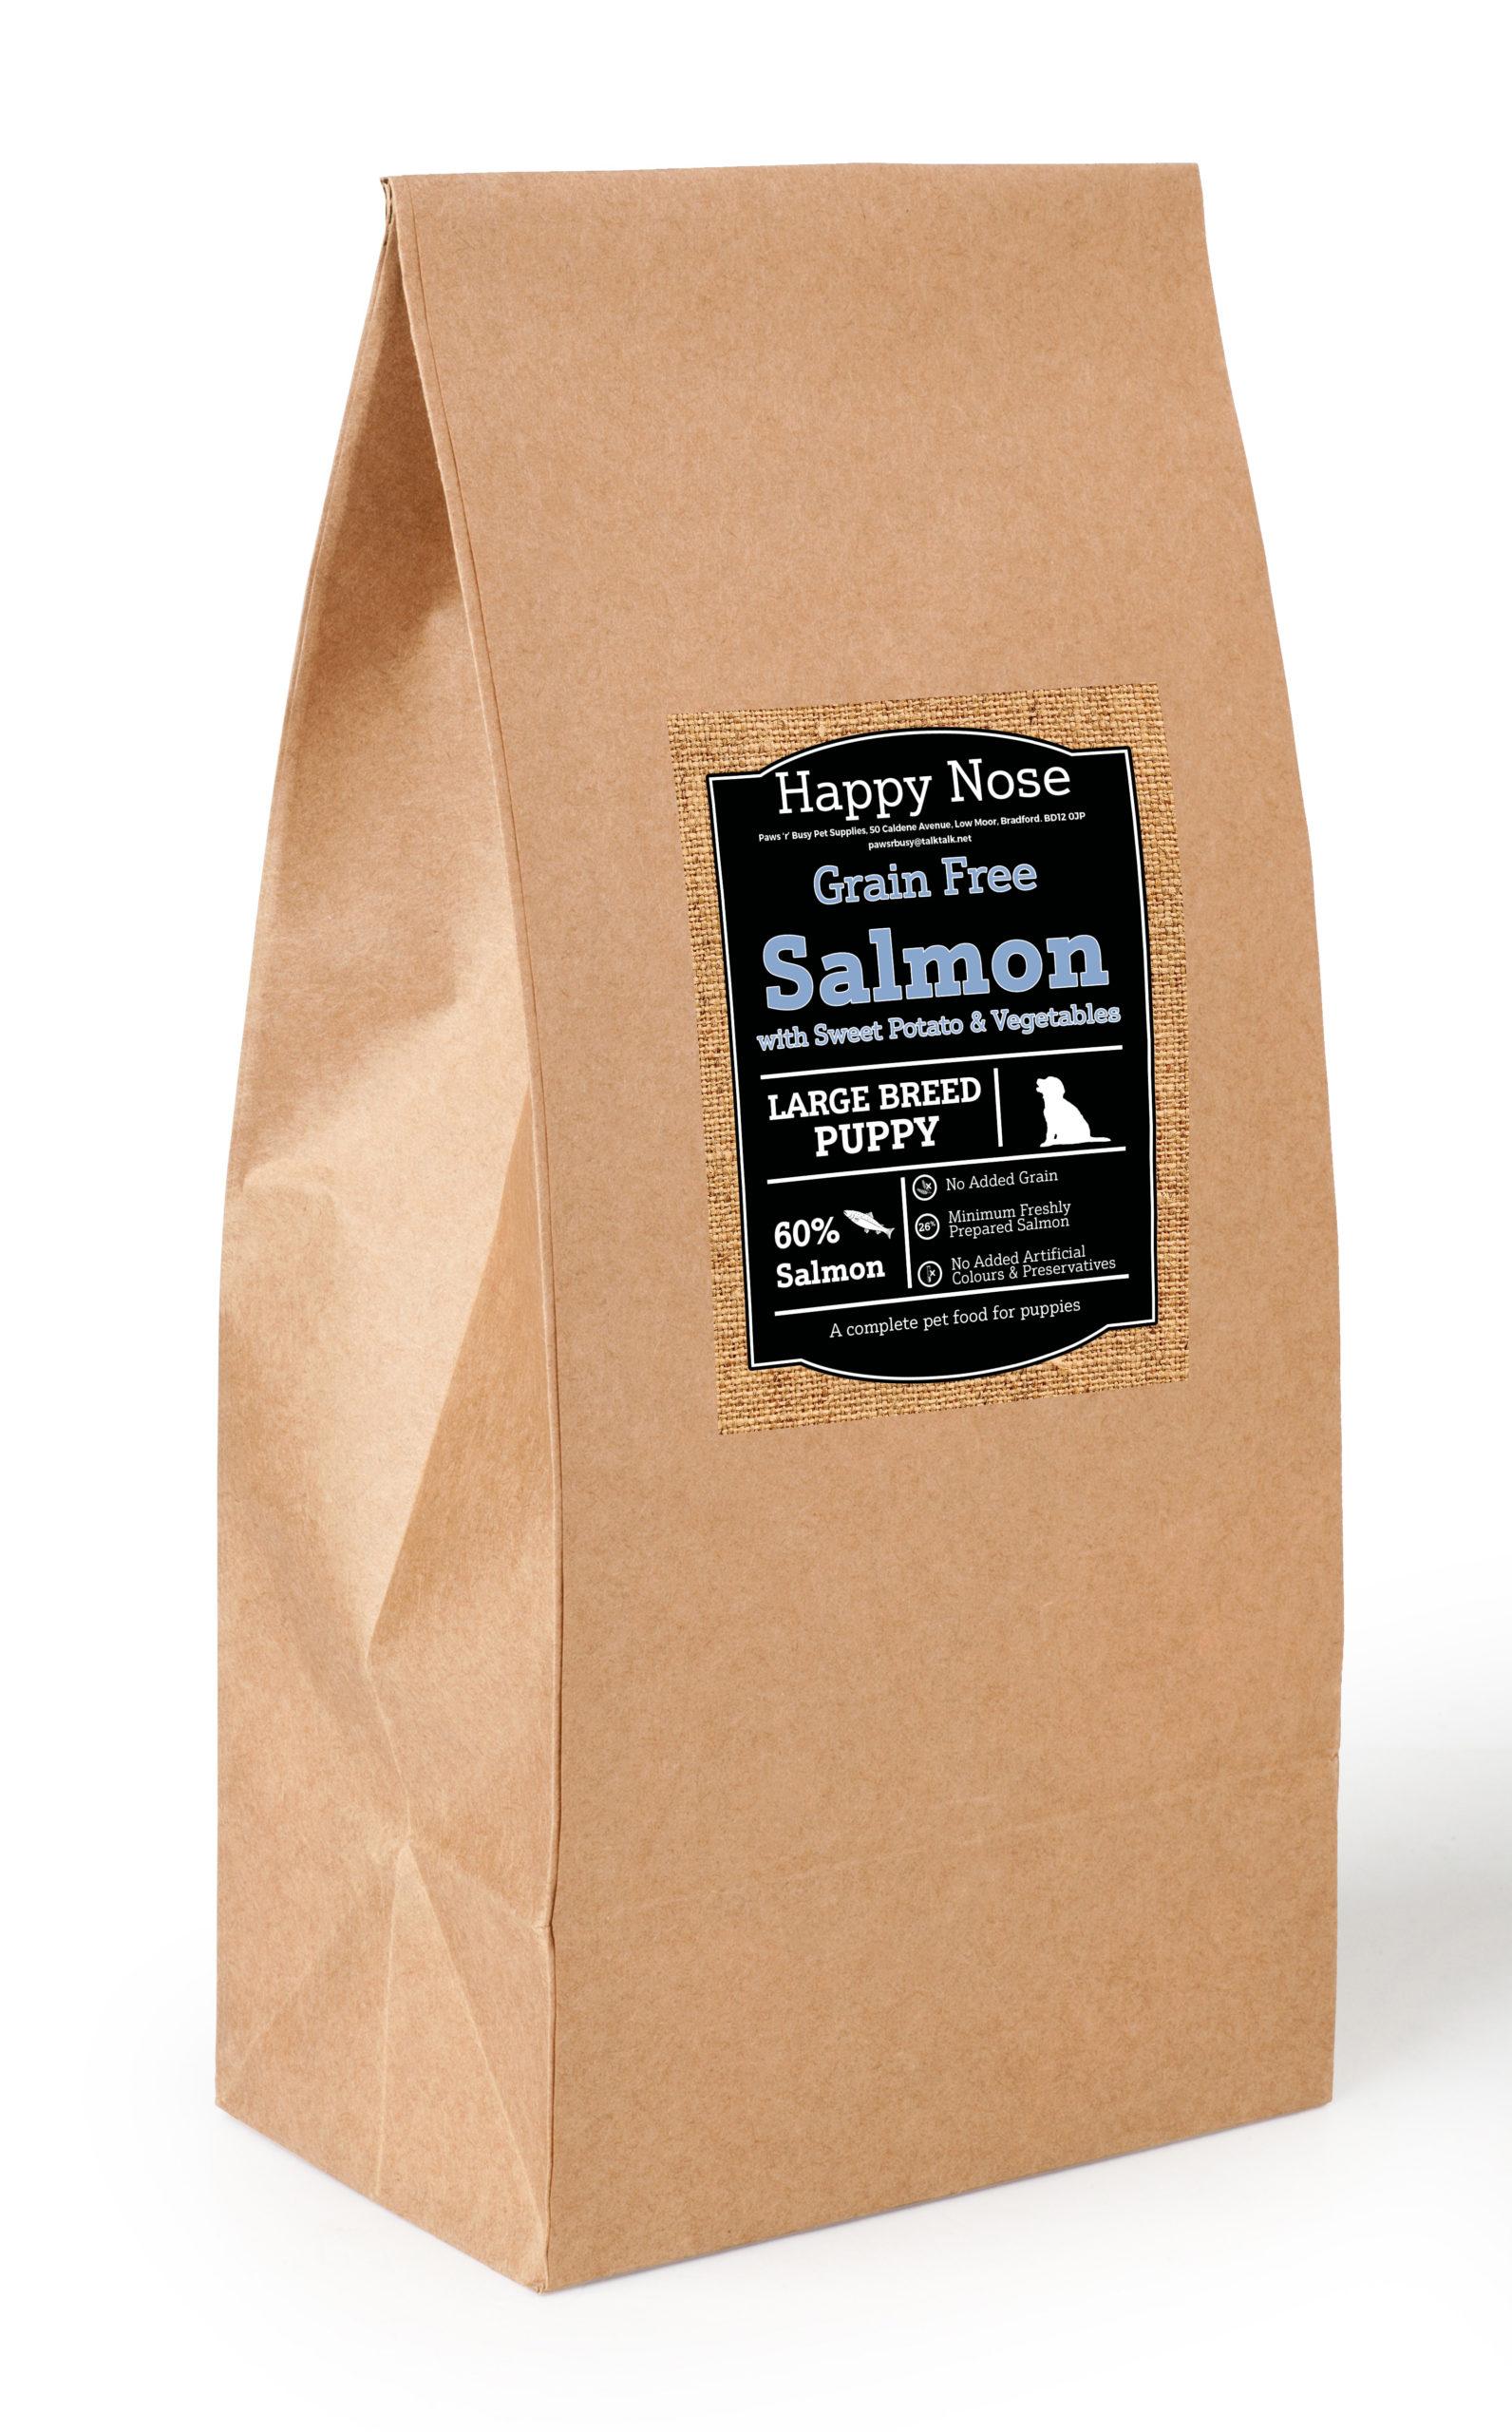 Large Breed Salmon, Sweet Potato & Vegetables Grain Free Puppy